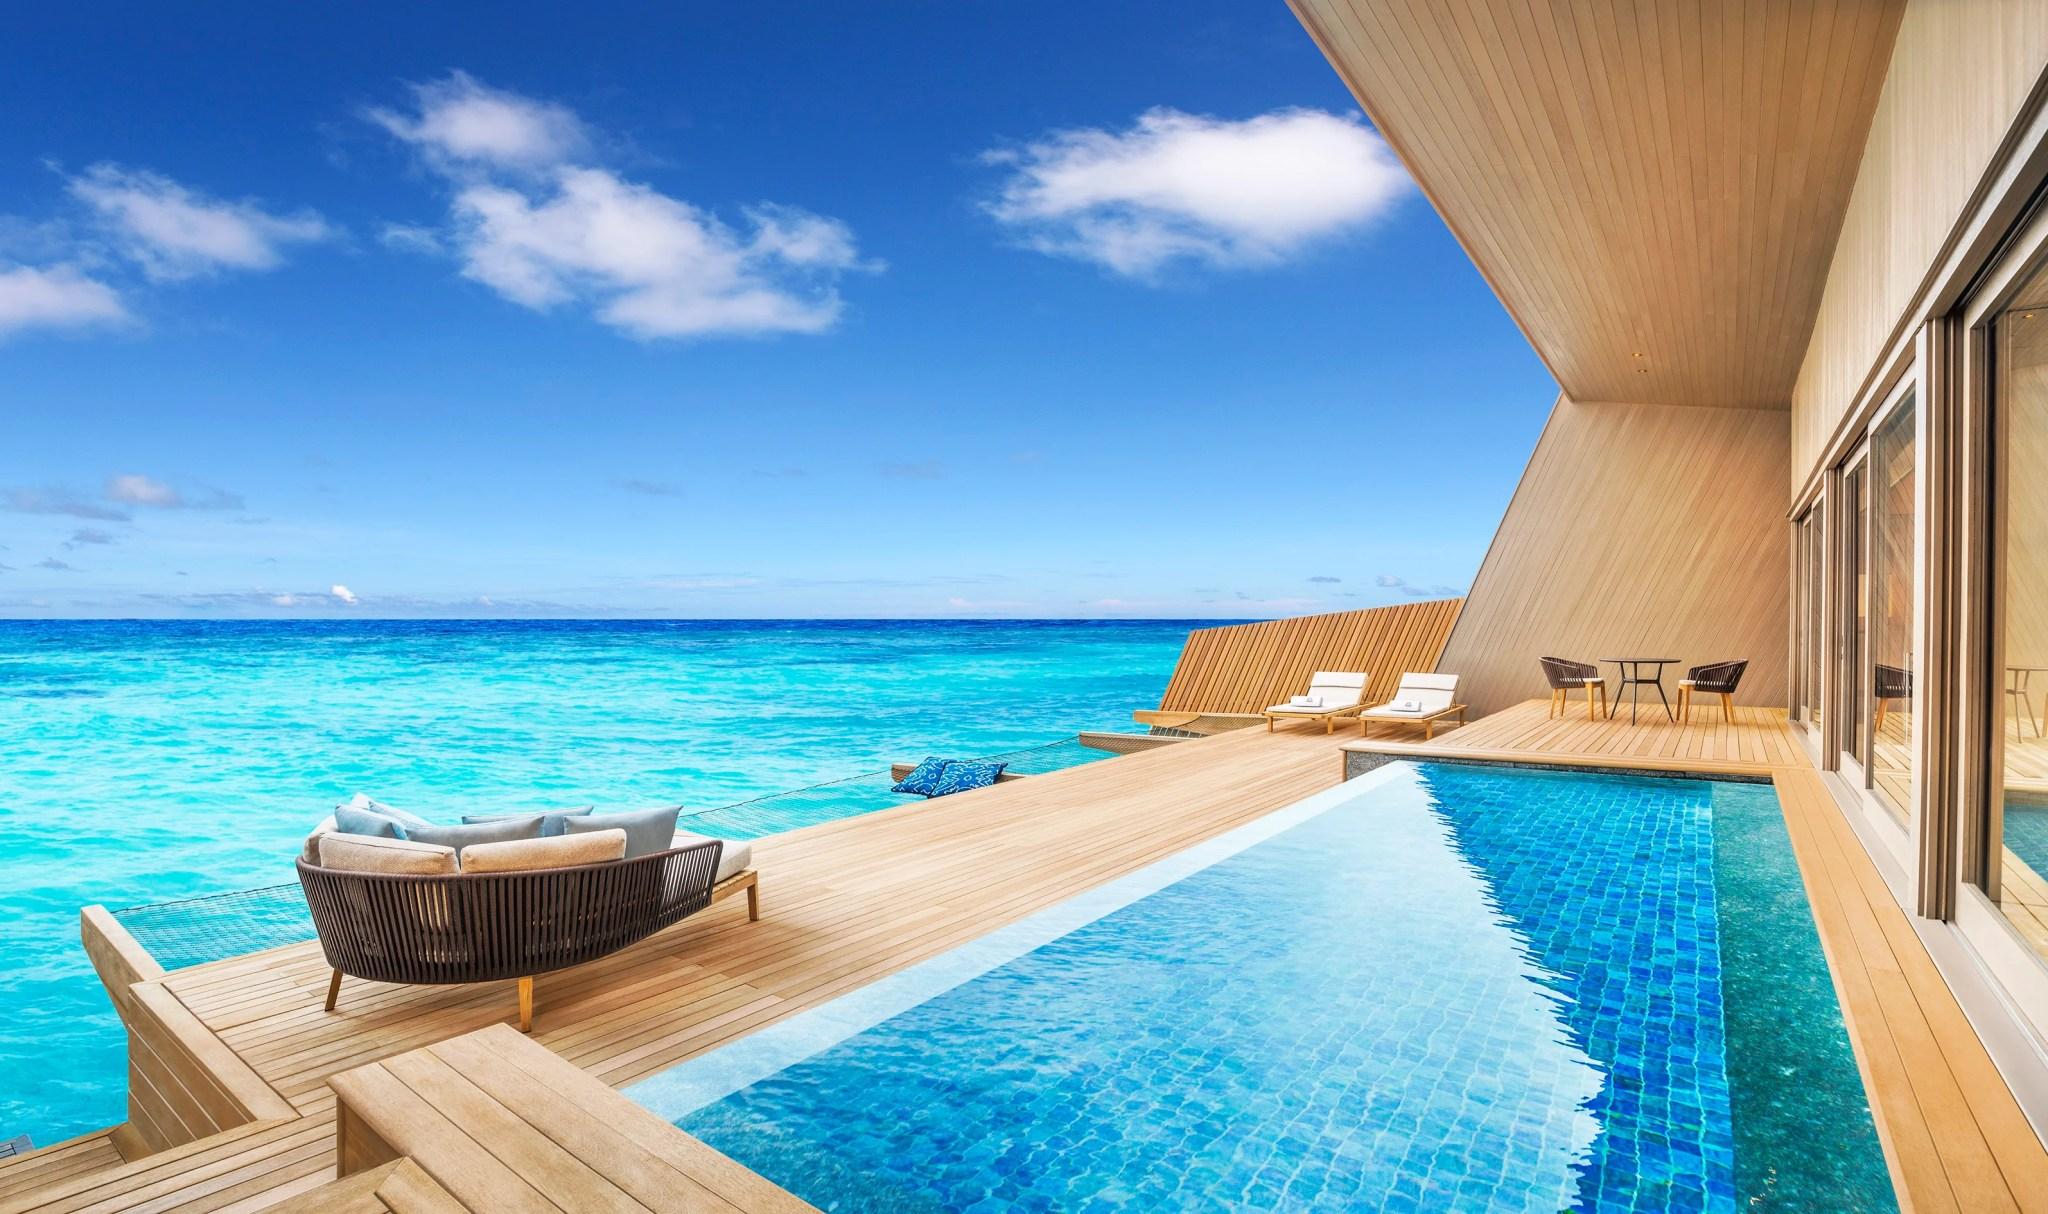 Spg Hotels South Beach